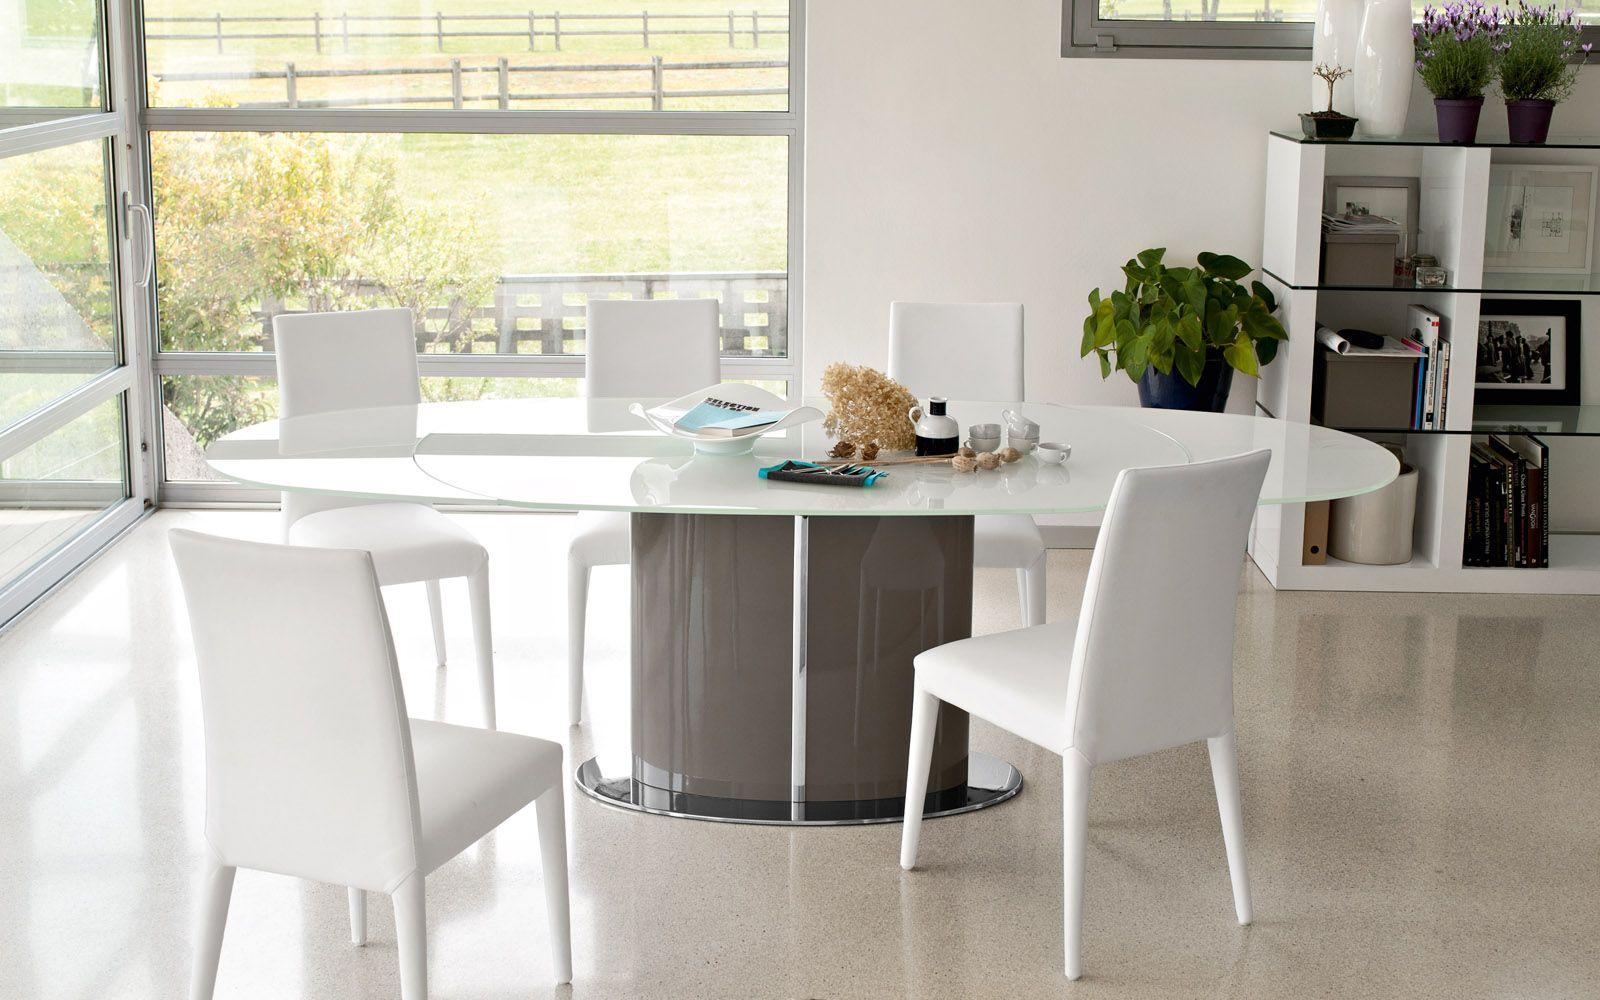 Odyssey oval extending dining table Calligaris | CS/4043 | tafels ...